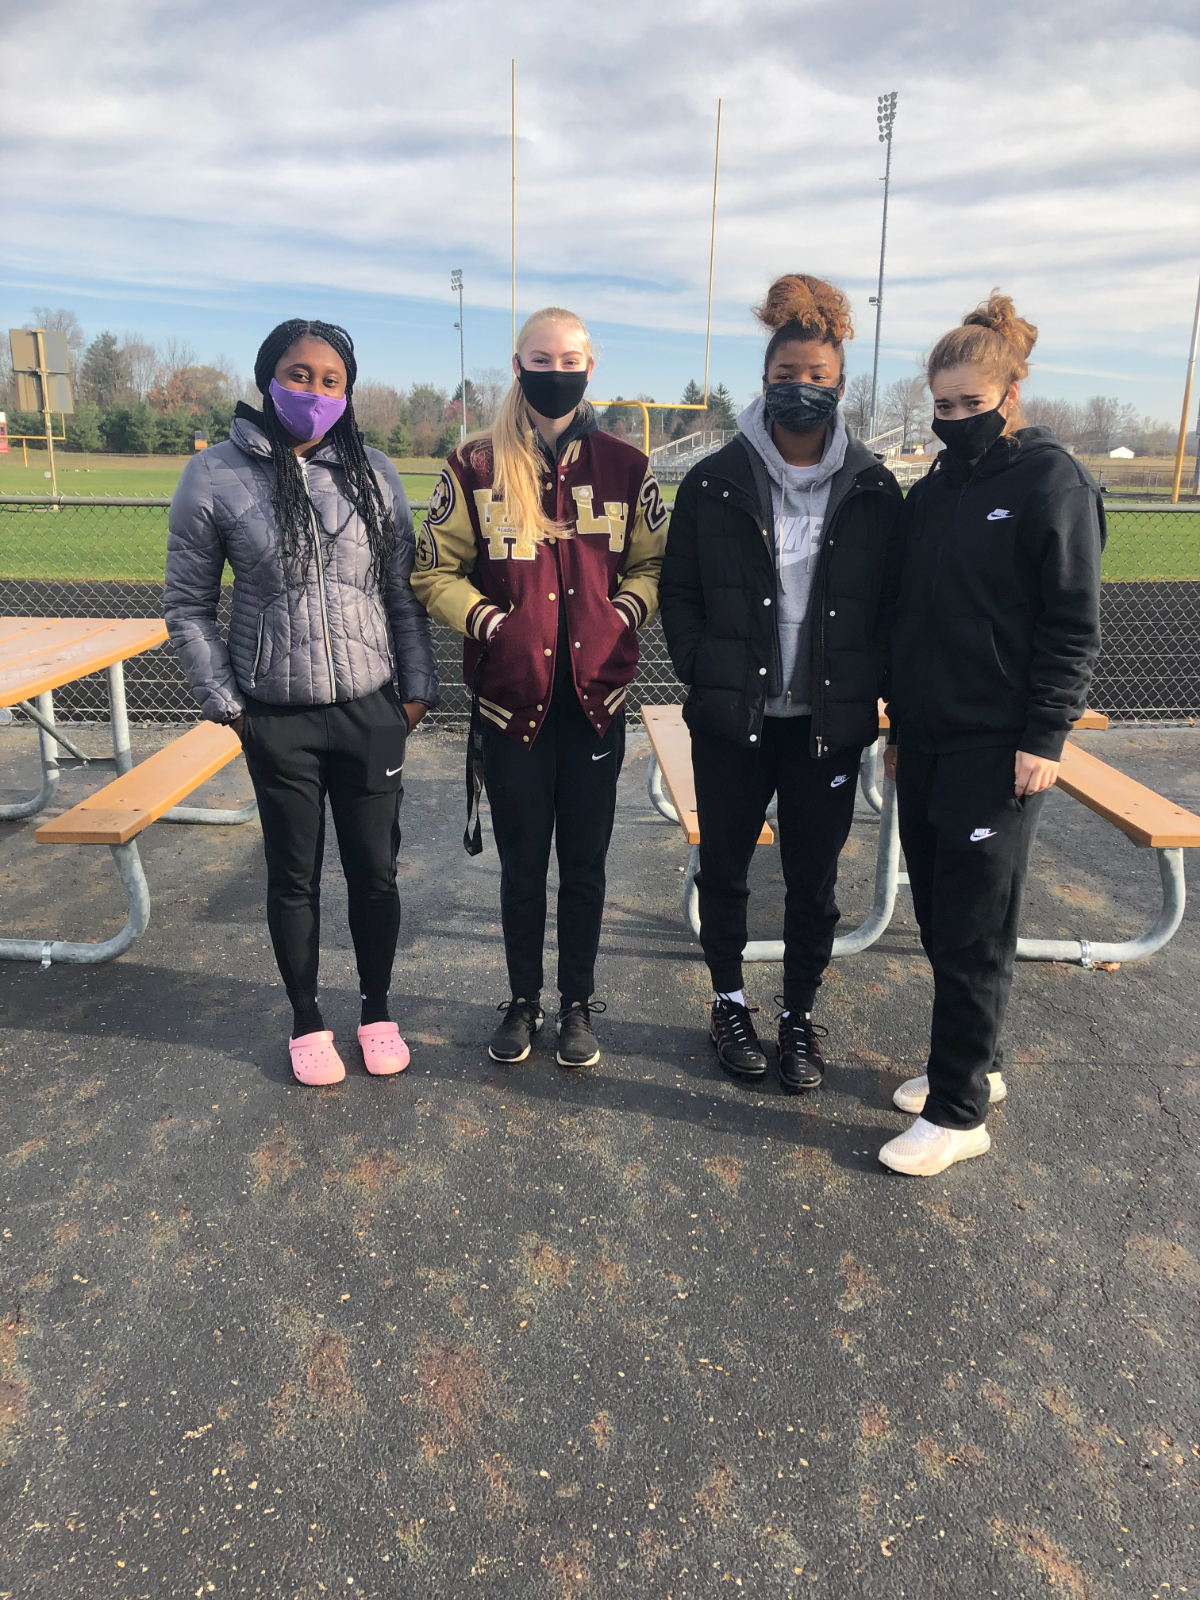 GIRLS BASKETBALL WALK-A-THON 11/14/20